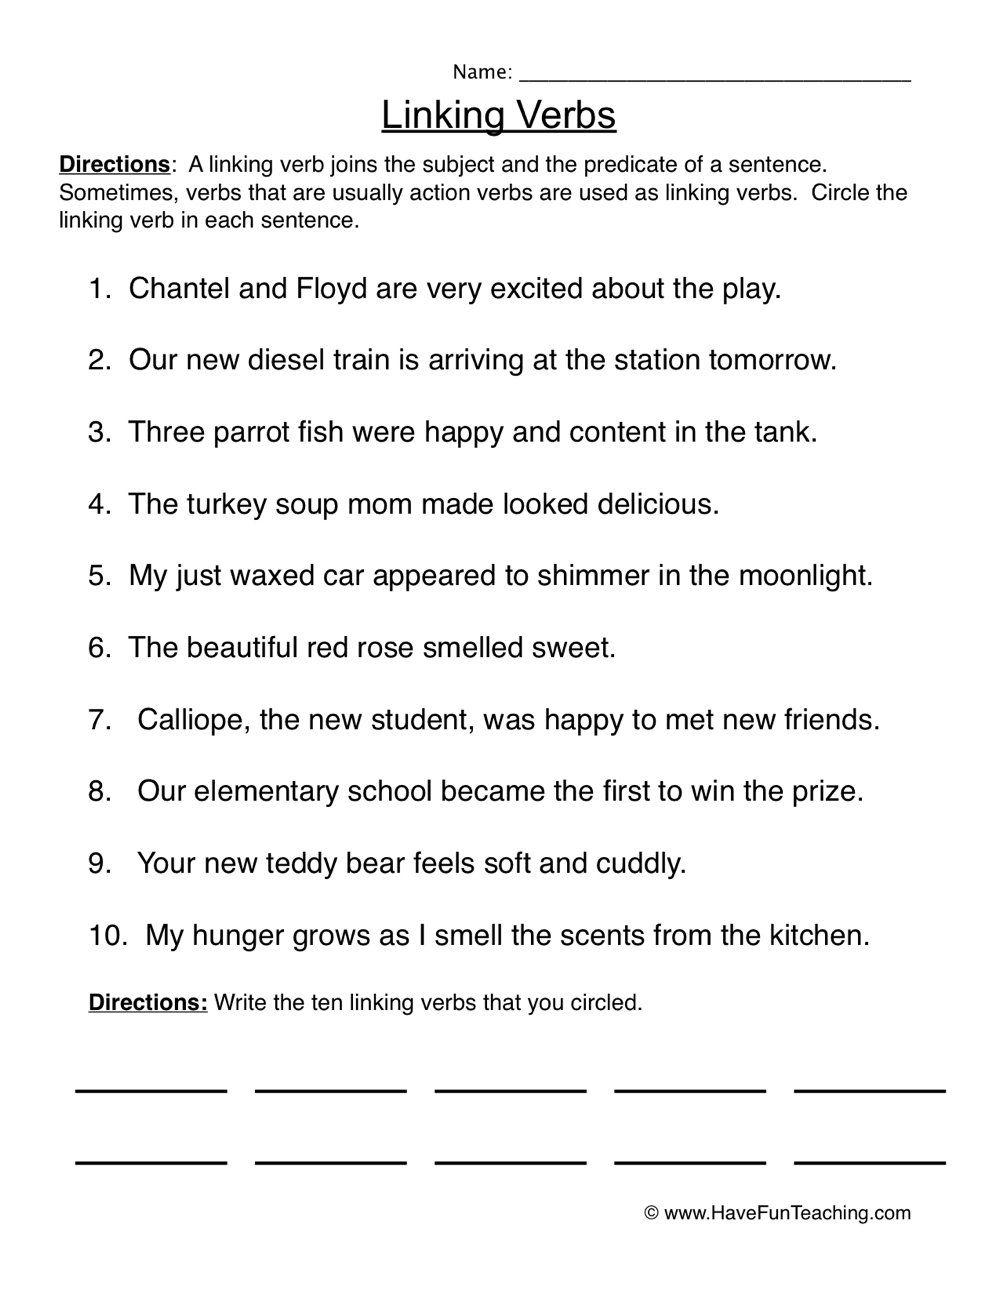 Verbs Worksheets Have Fun Teaching In 2020 Linking Verbs Verb Worksheets Linking Verbs Worksheet